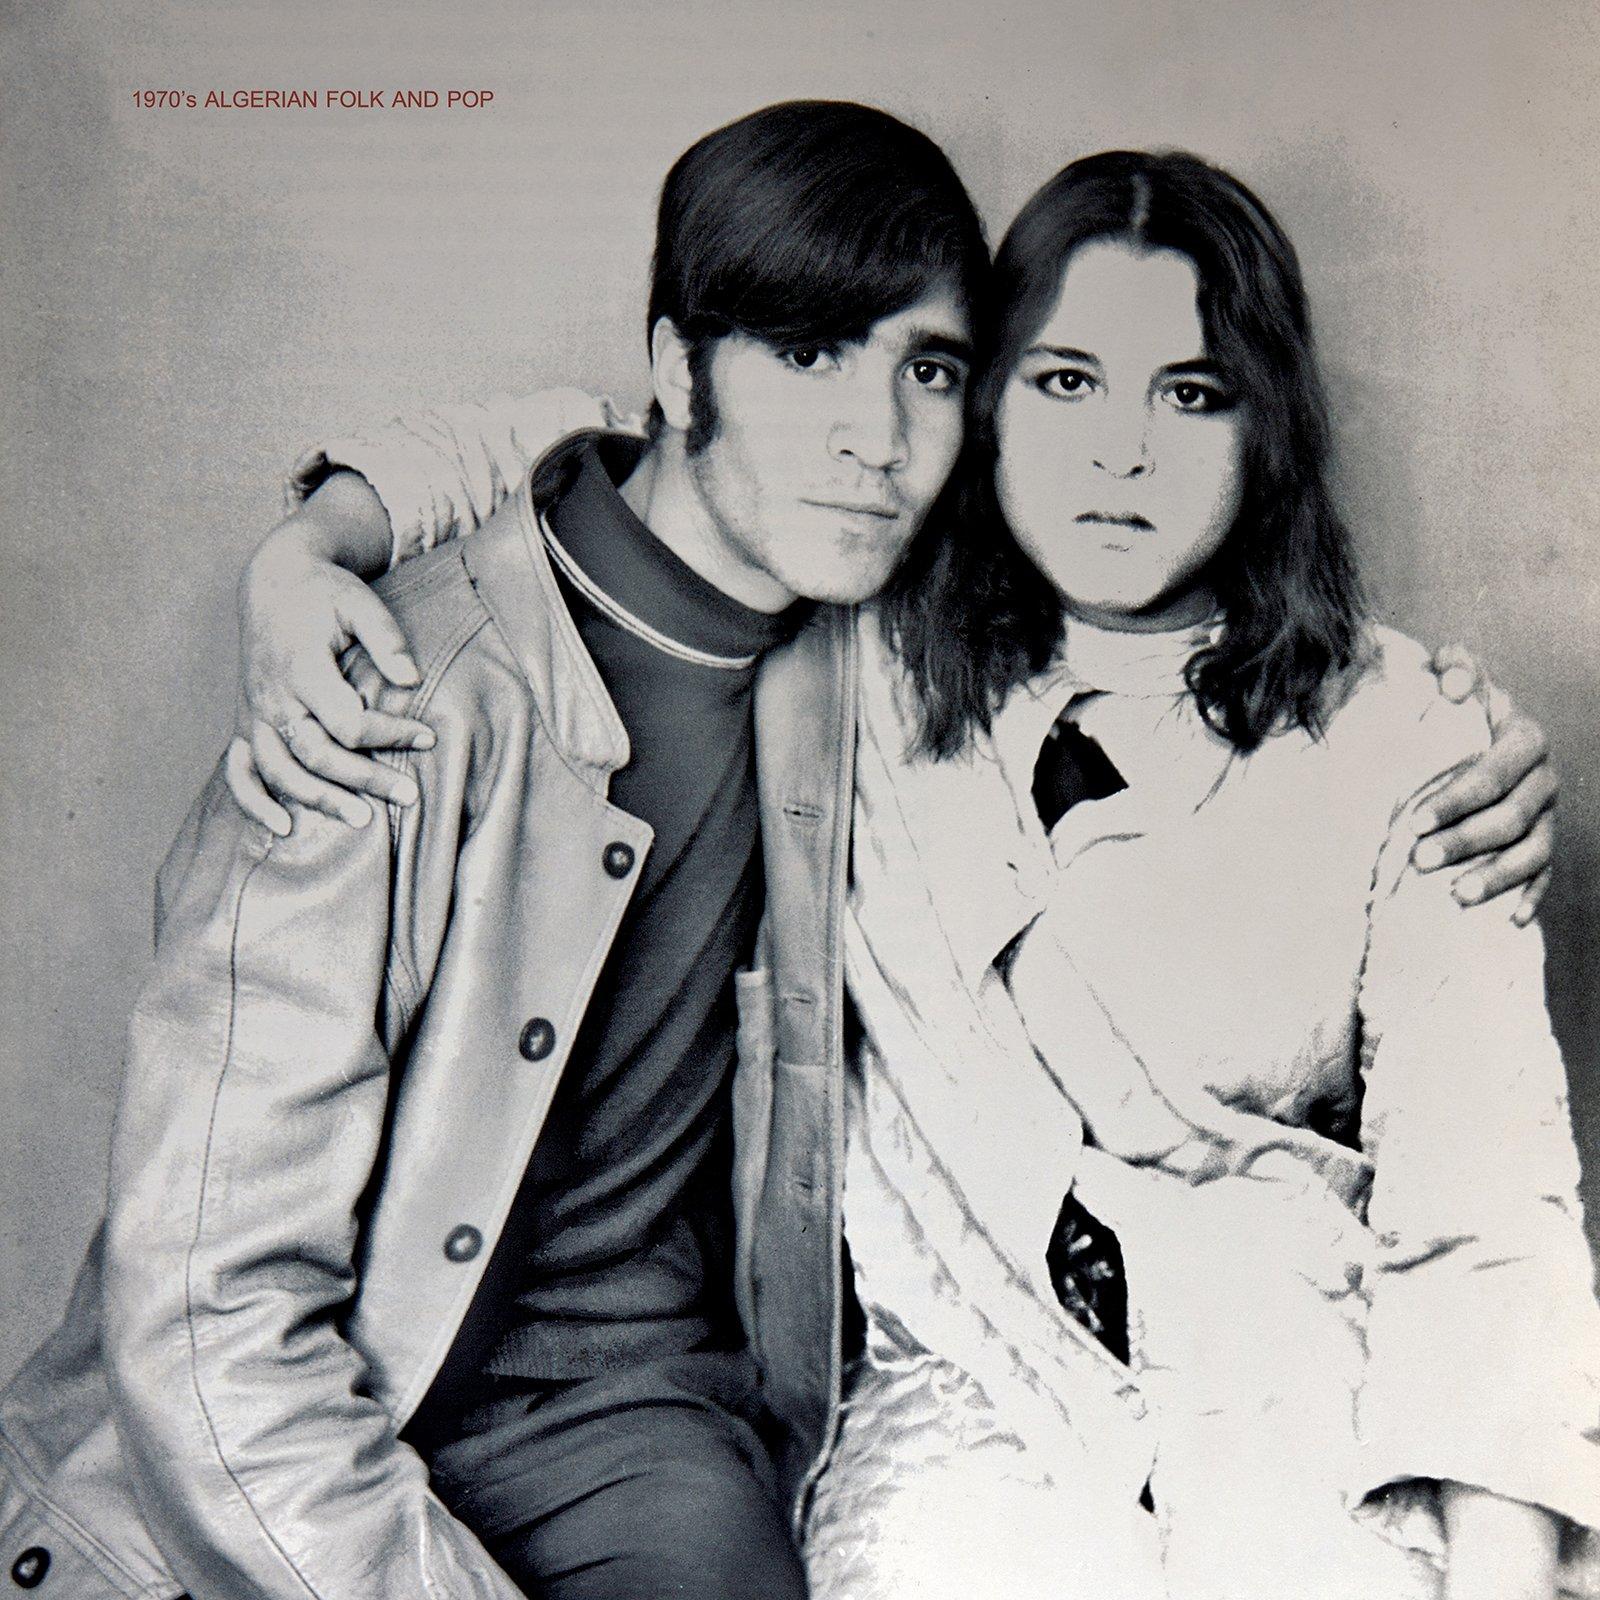 1970s Algerian Folk & Pop